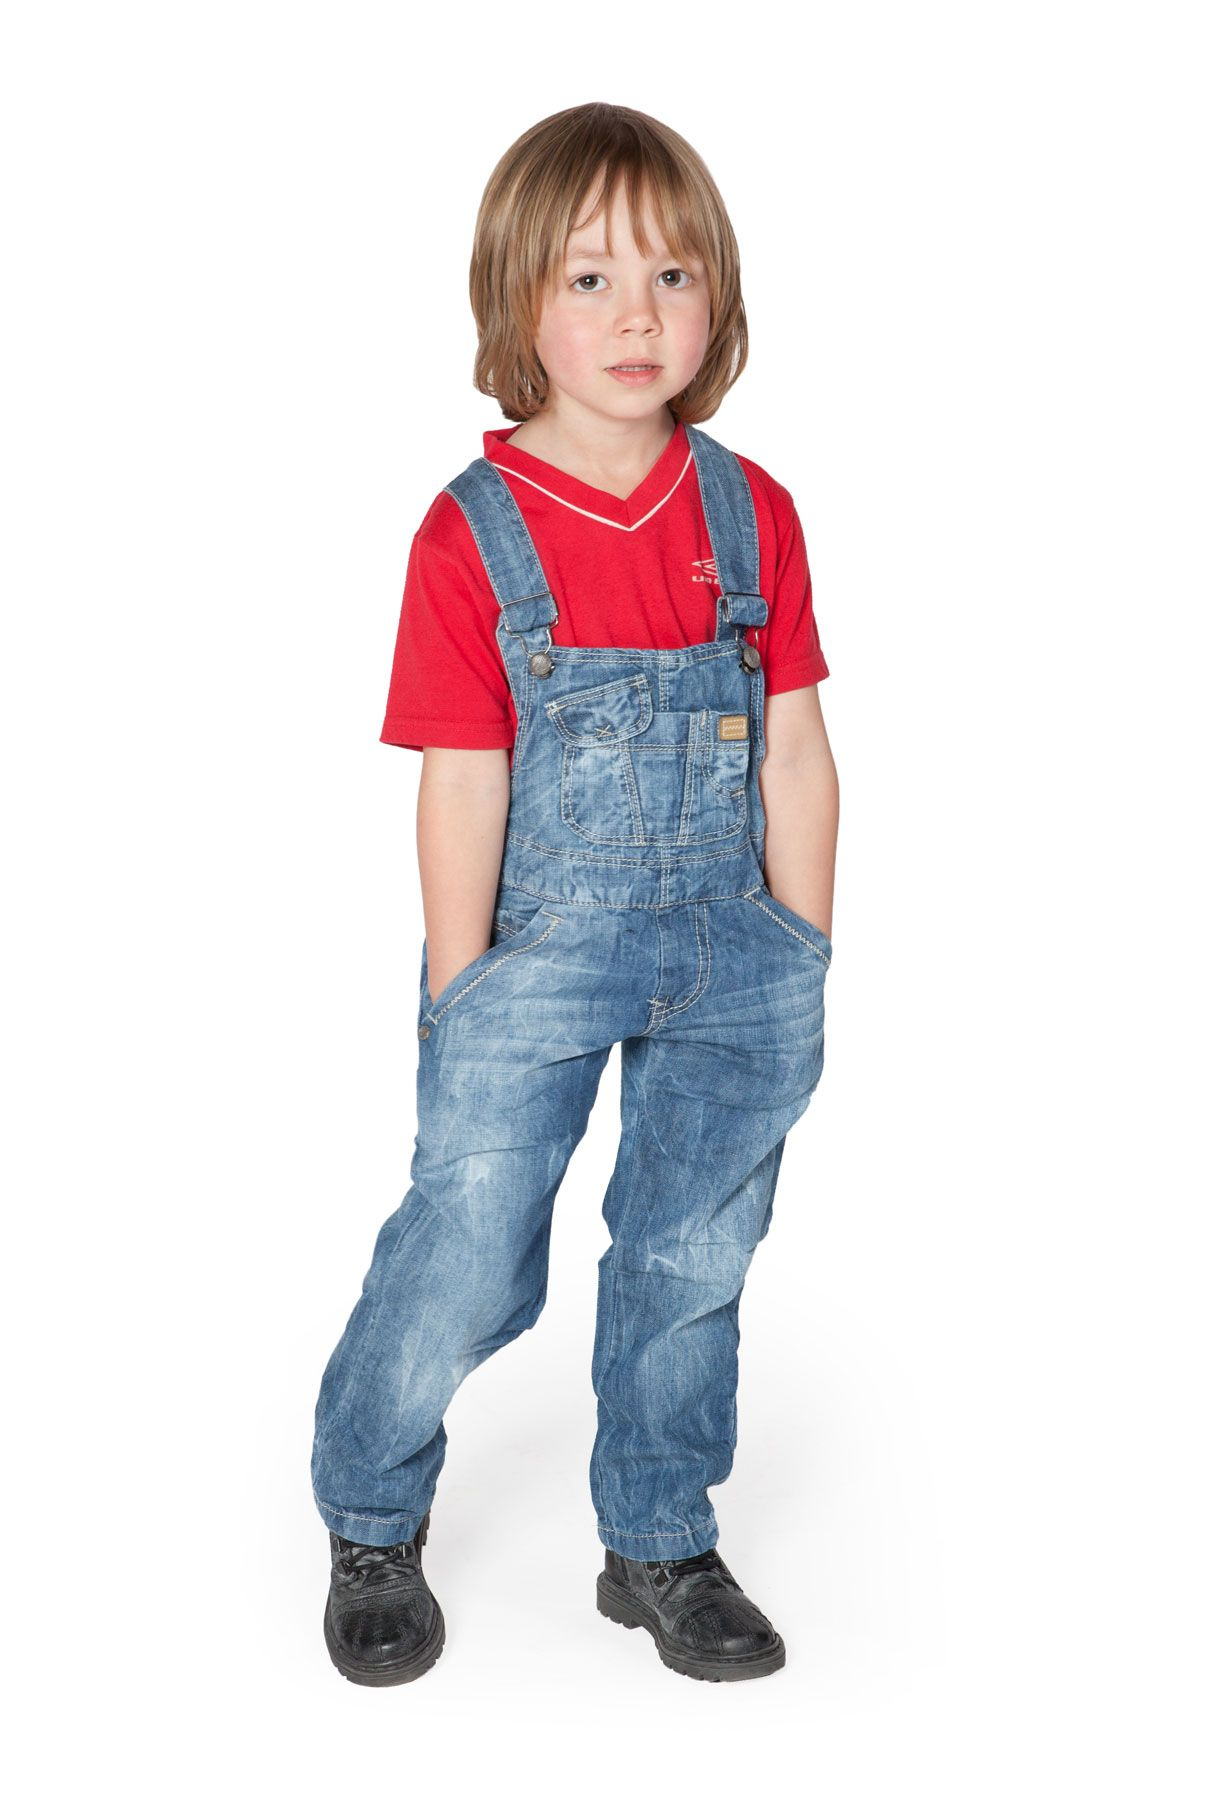 9d1ef1ecdda Slim Leg Denim Overalls for boys and girls. #dungarees #overalls  #kidsfashion